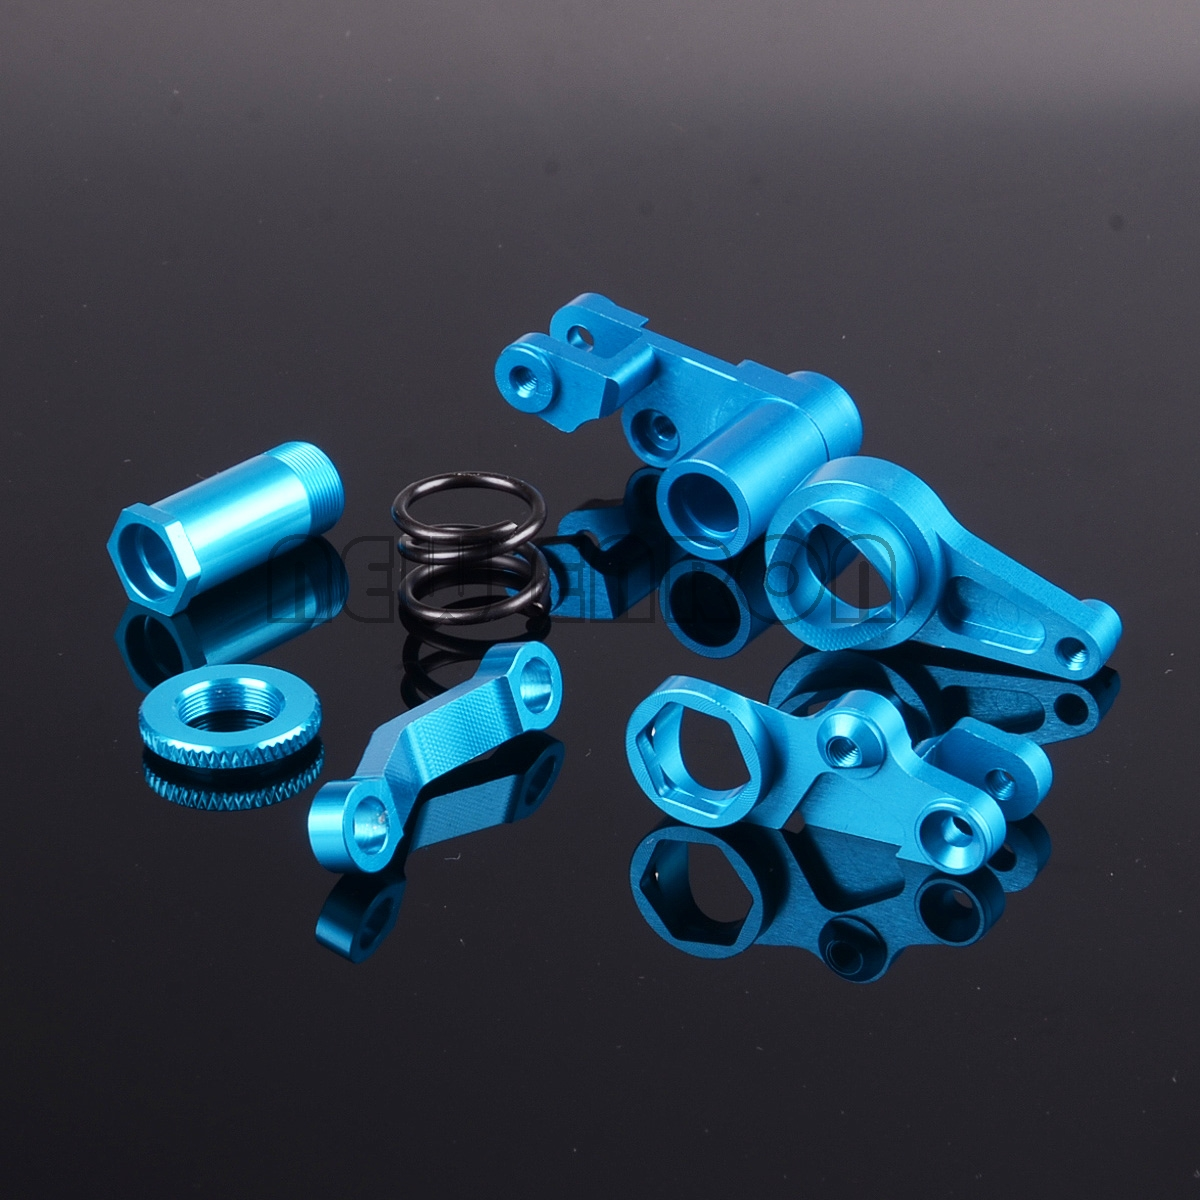 NEW ENRON #6845X Alloy Steering Bellcranks Servo Saver Set For RC Traxxas 1/10 Slash 4x4 Rustler Stampede XO-1 Upgrade Parts